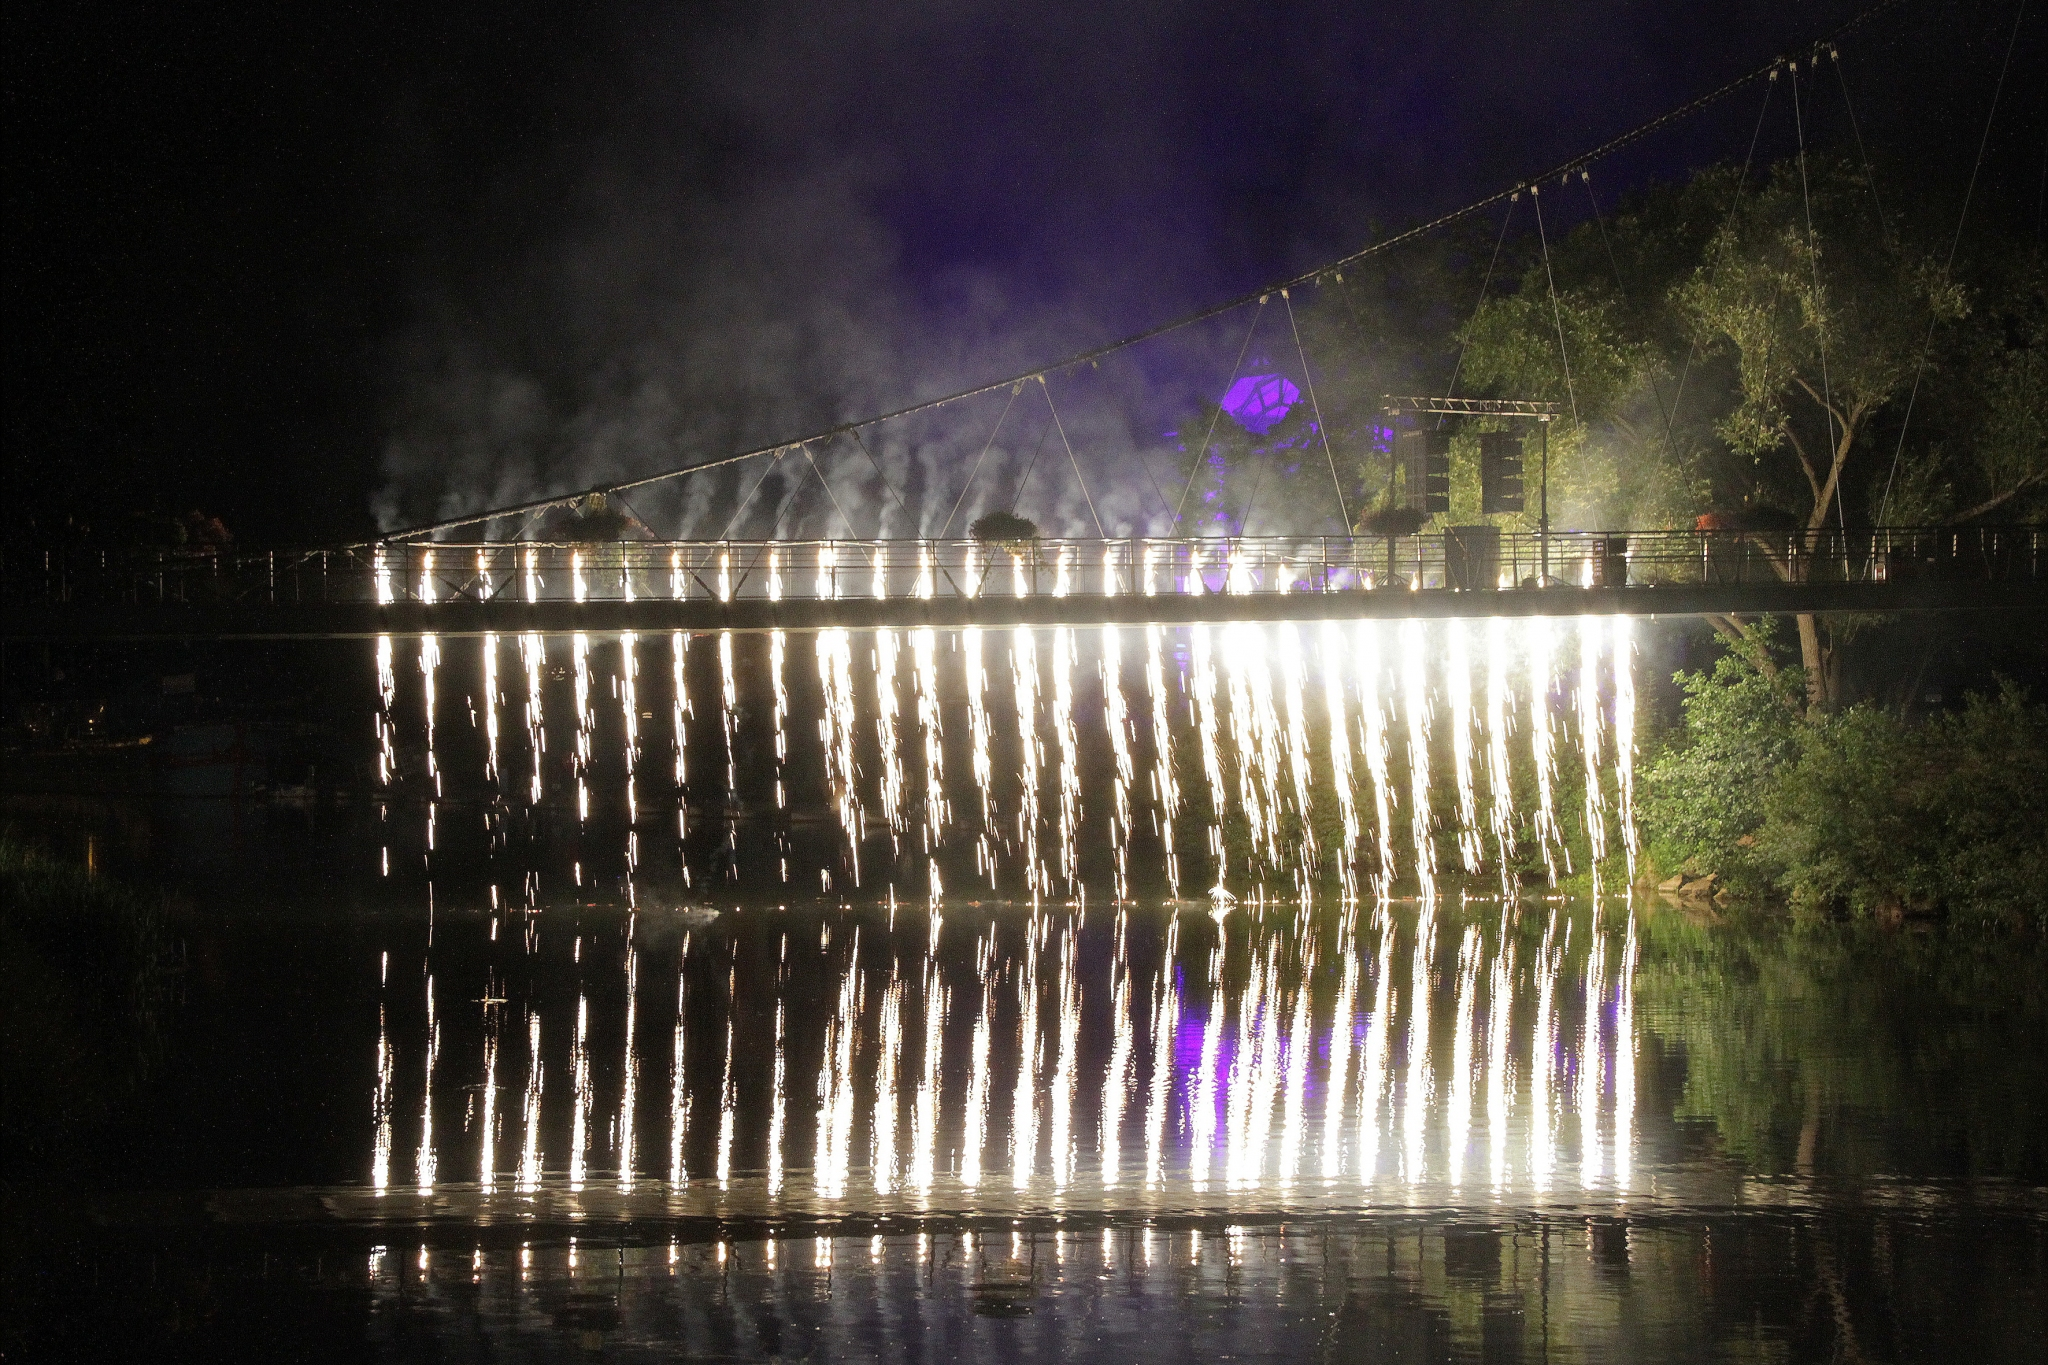 CAHN-Guylaine-Expo-2019-Projection-3-Rideau-de-feu